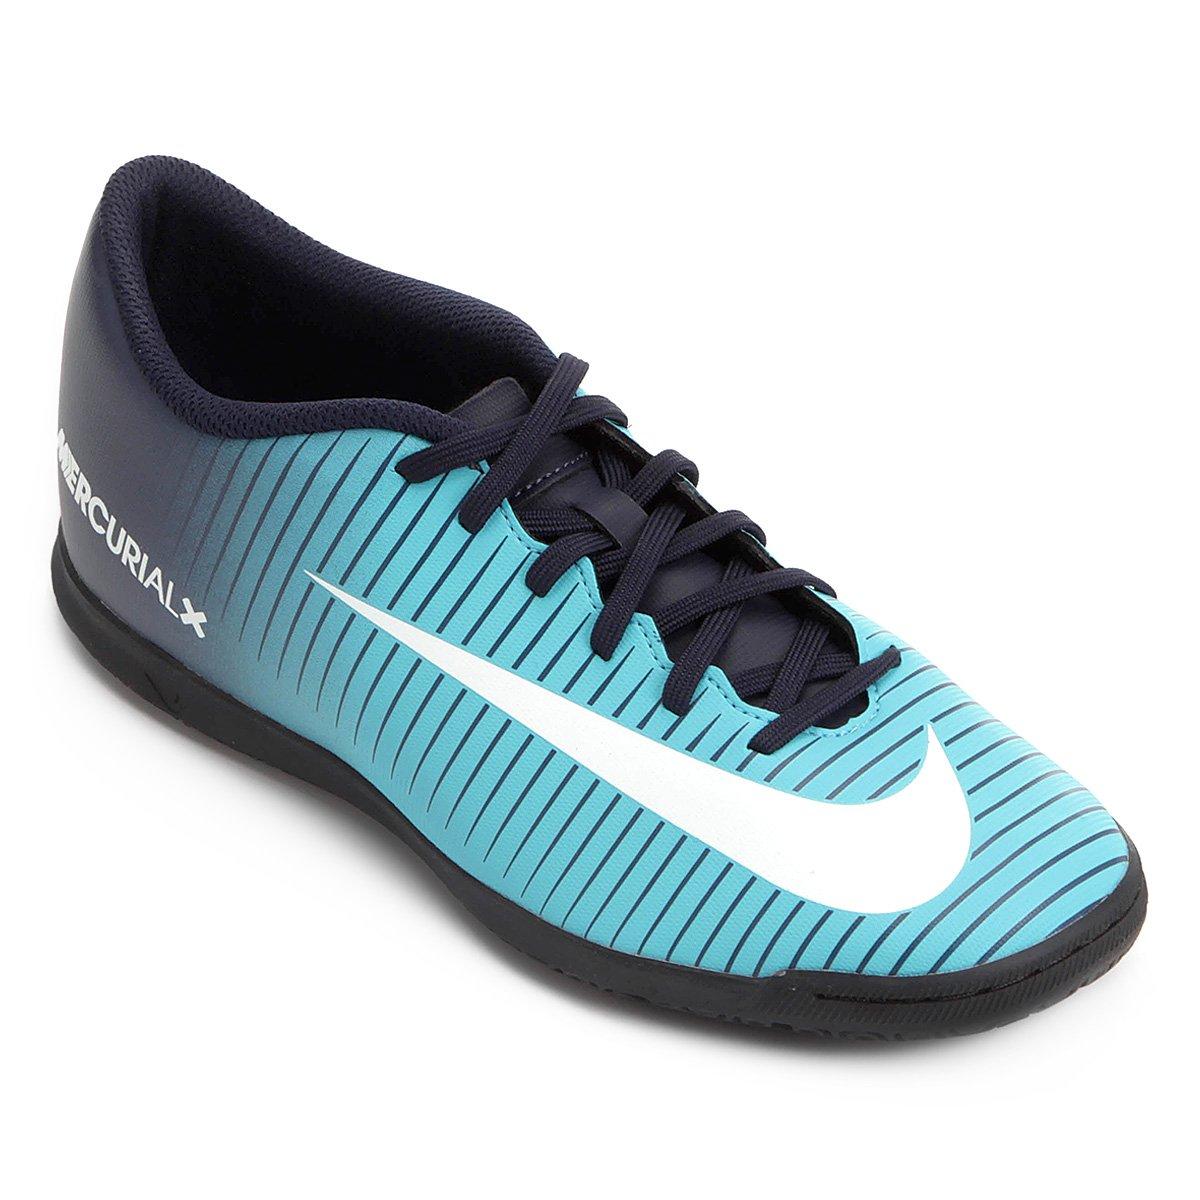 1bd4c02f70b Chuteira Futsal Nike Mercurial Vortex 3 IC - Compre Agora